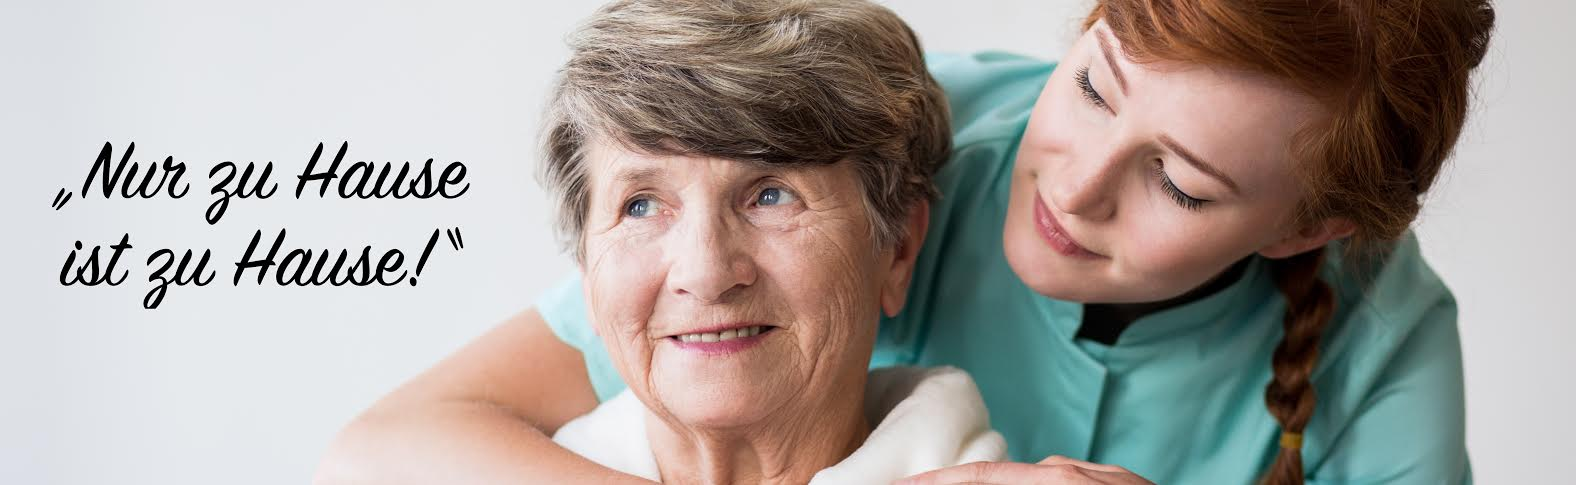 LK Betreuung & Service 24 H Seniorenbetreuung